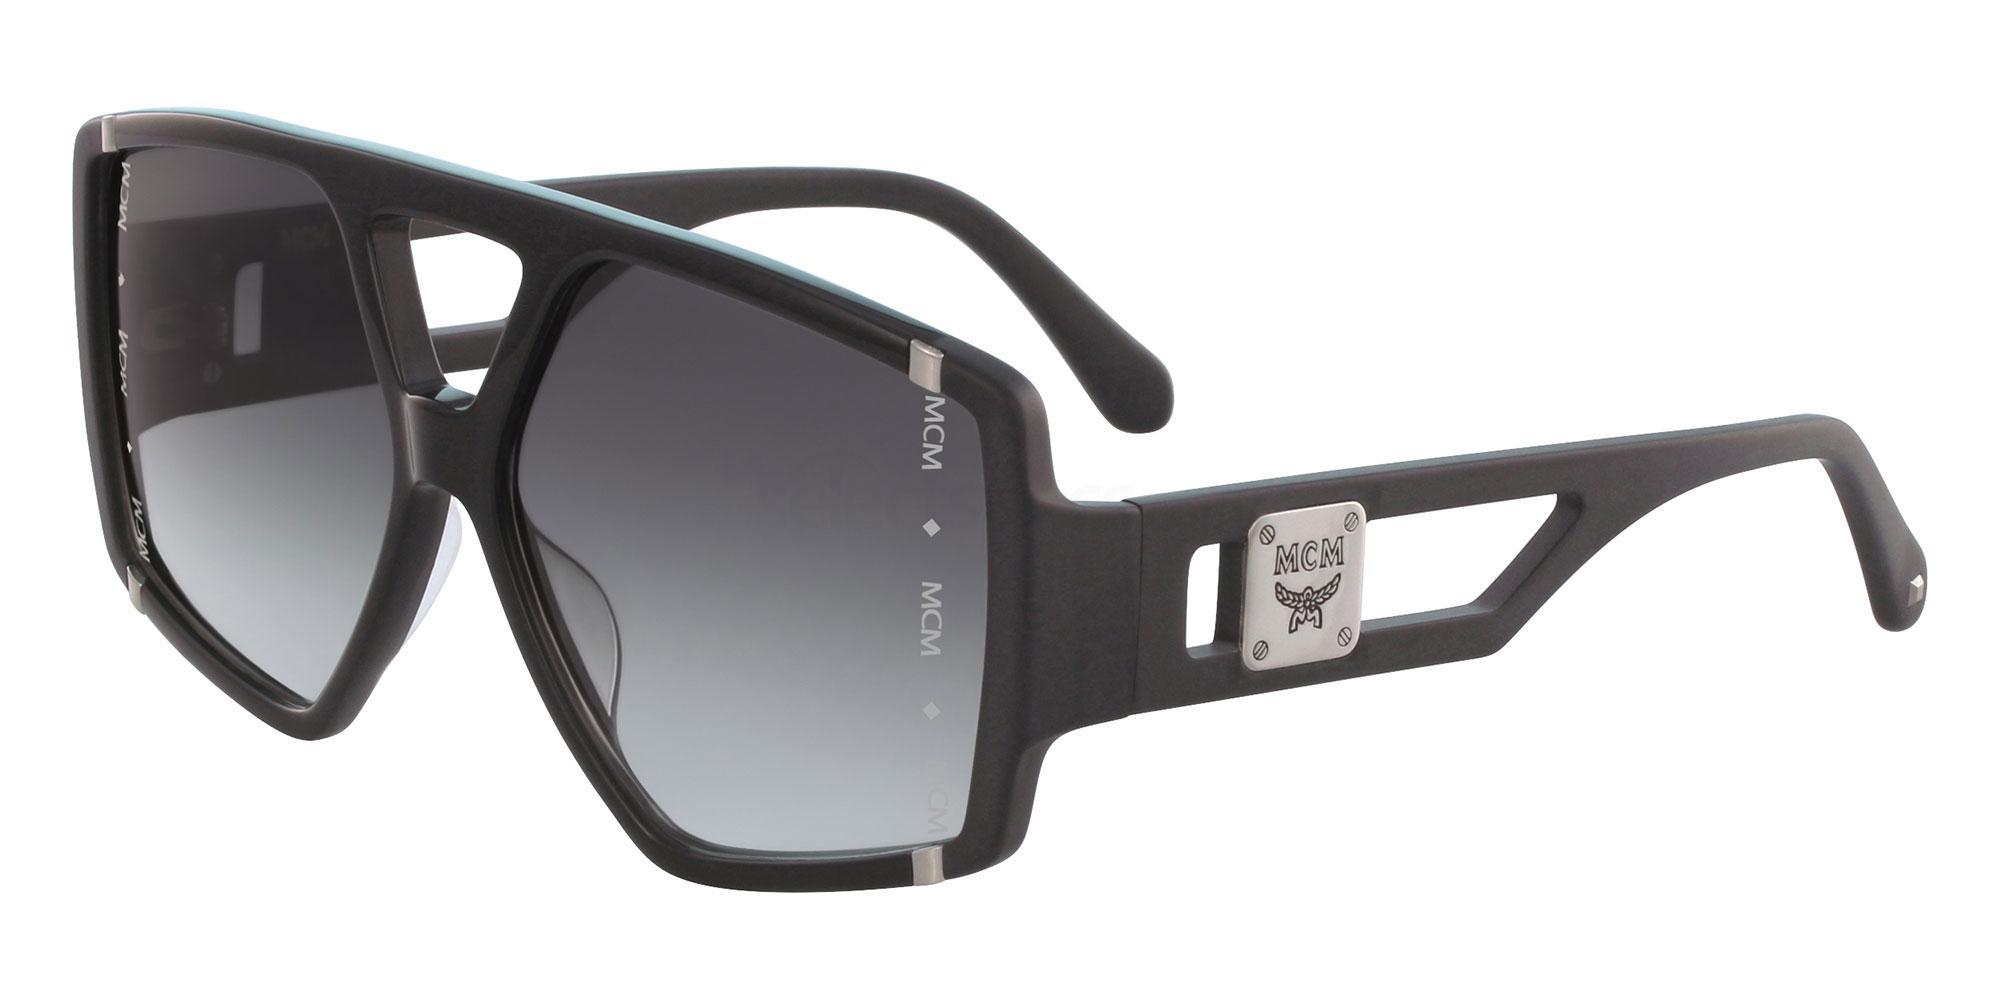 001 MCM671S Sunglasses, MCM